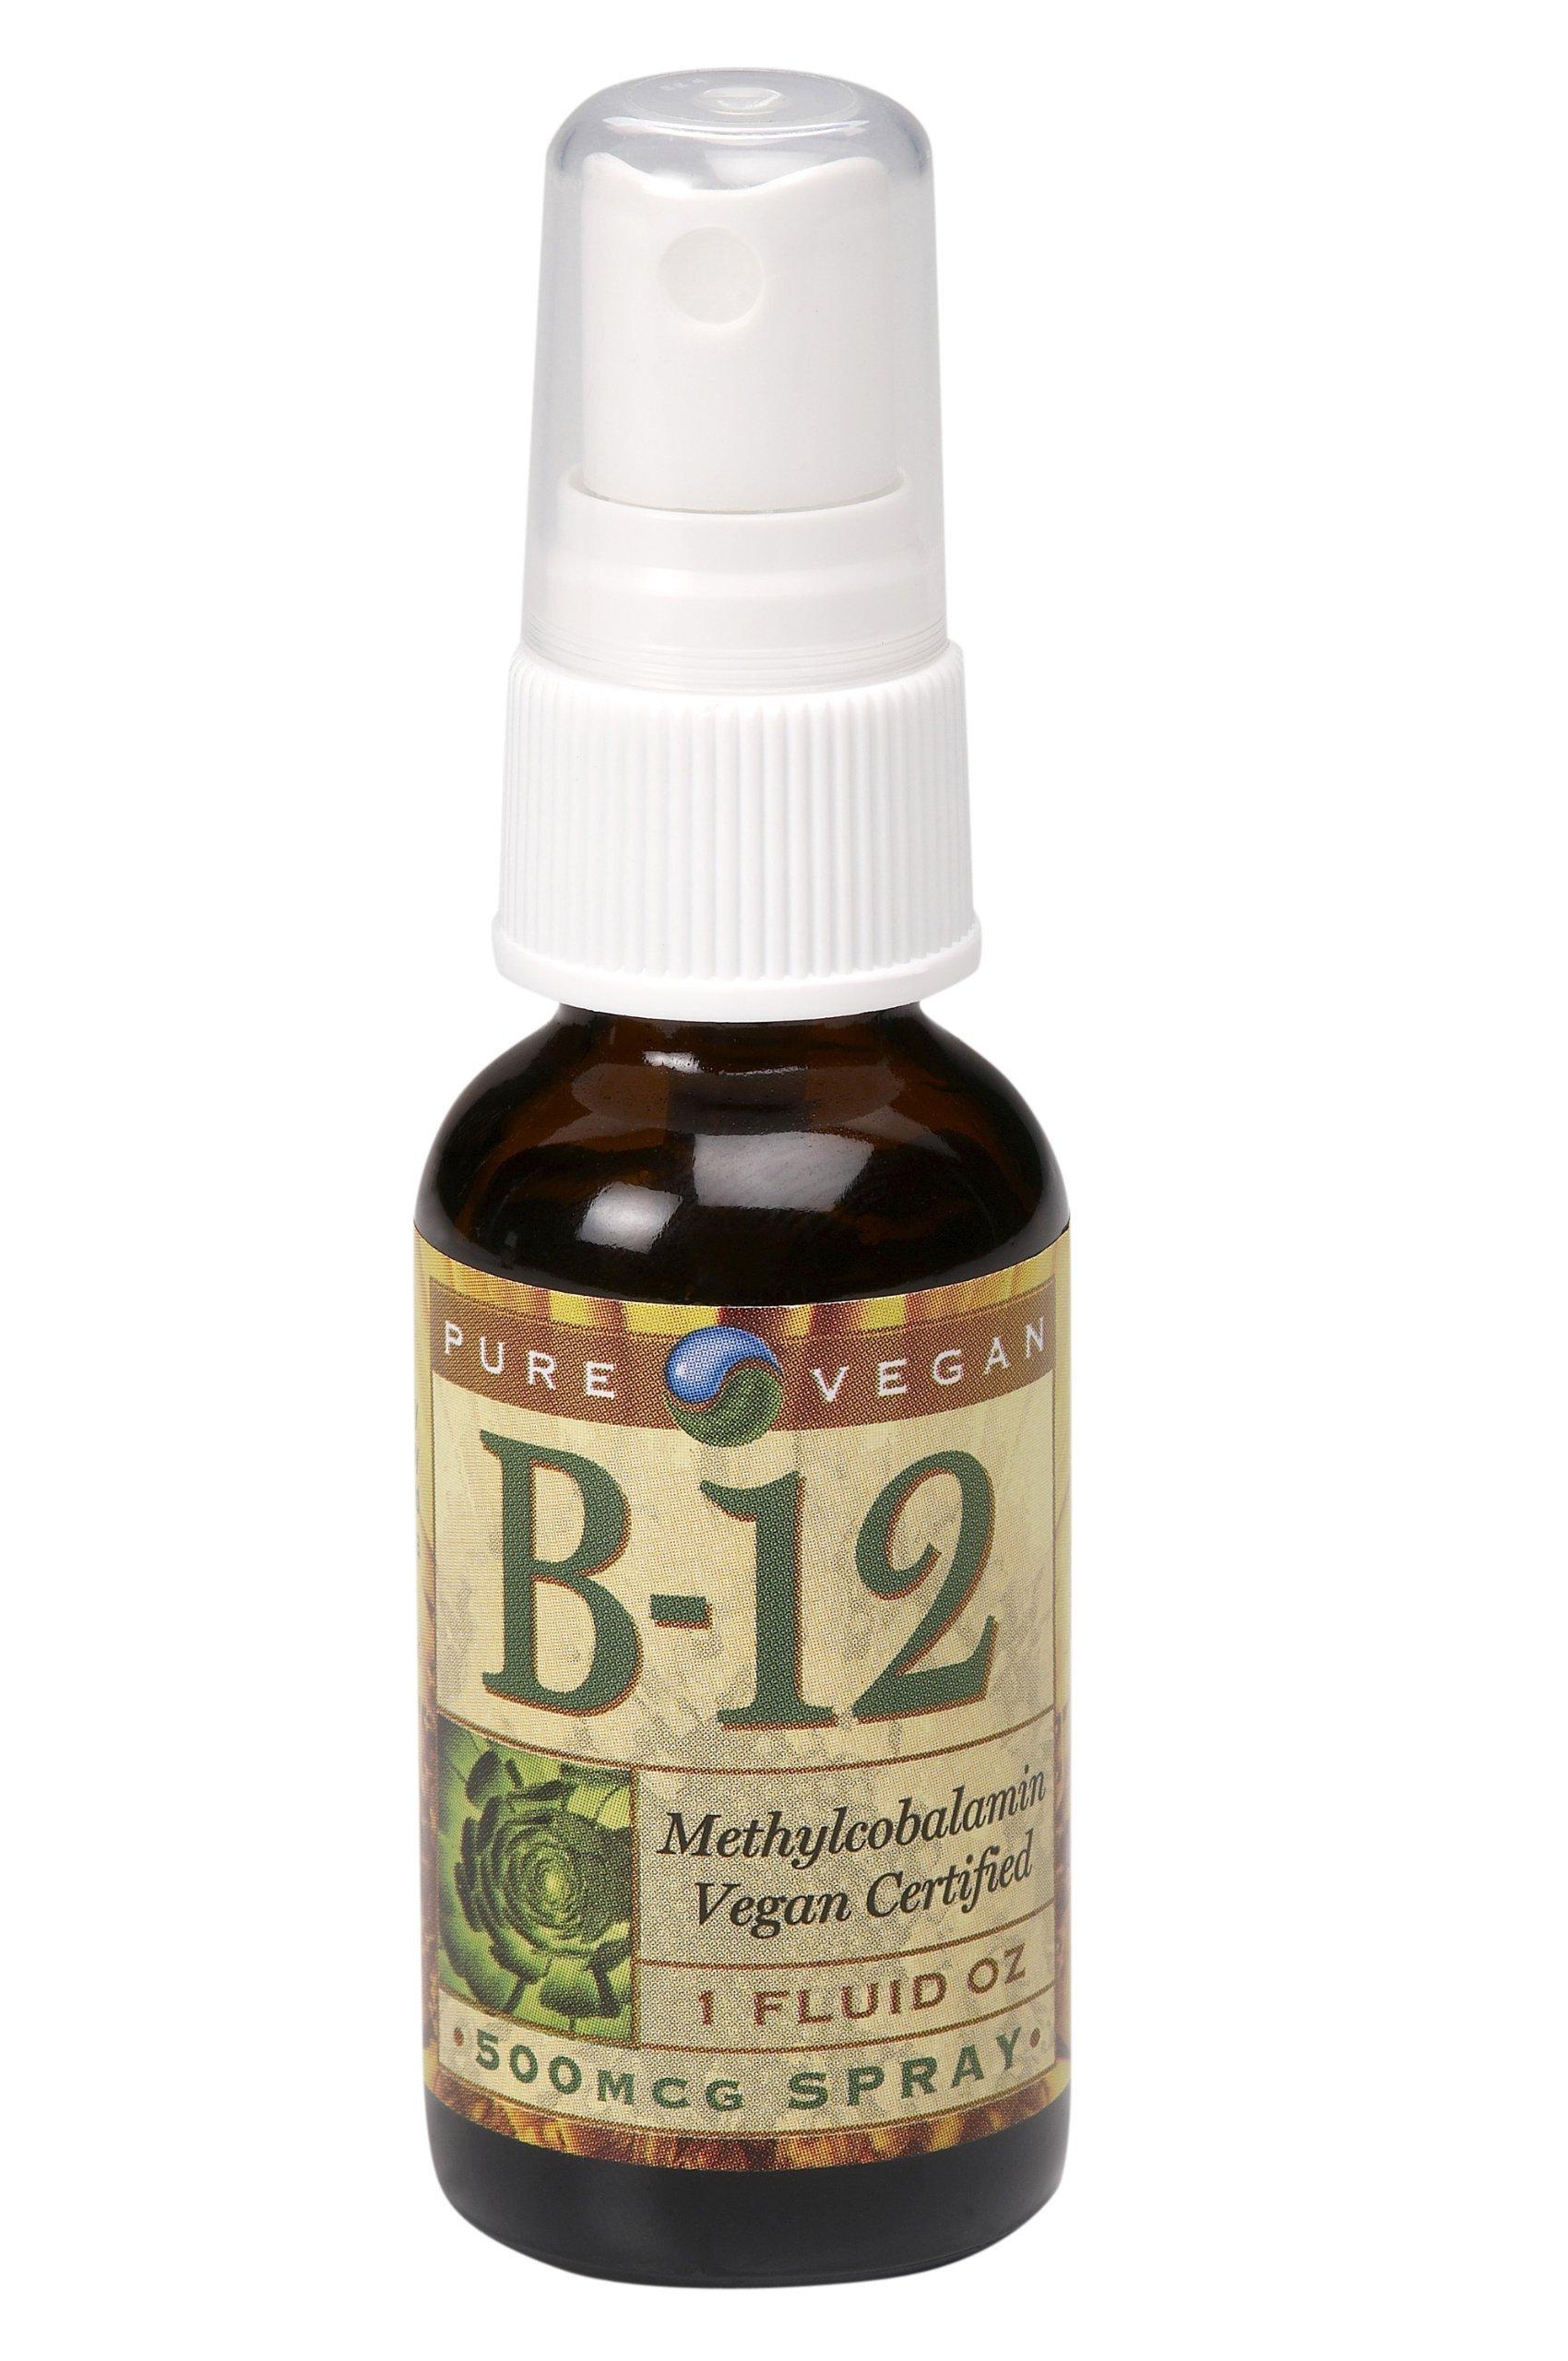 Pure Vegan Vitamin B12 Methylcobalamin Spray, 1 Ounce